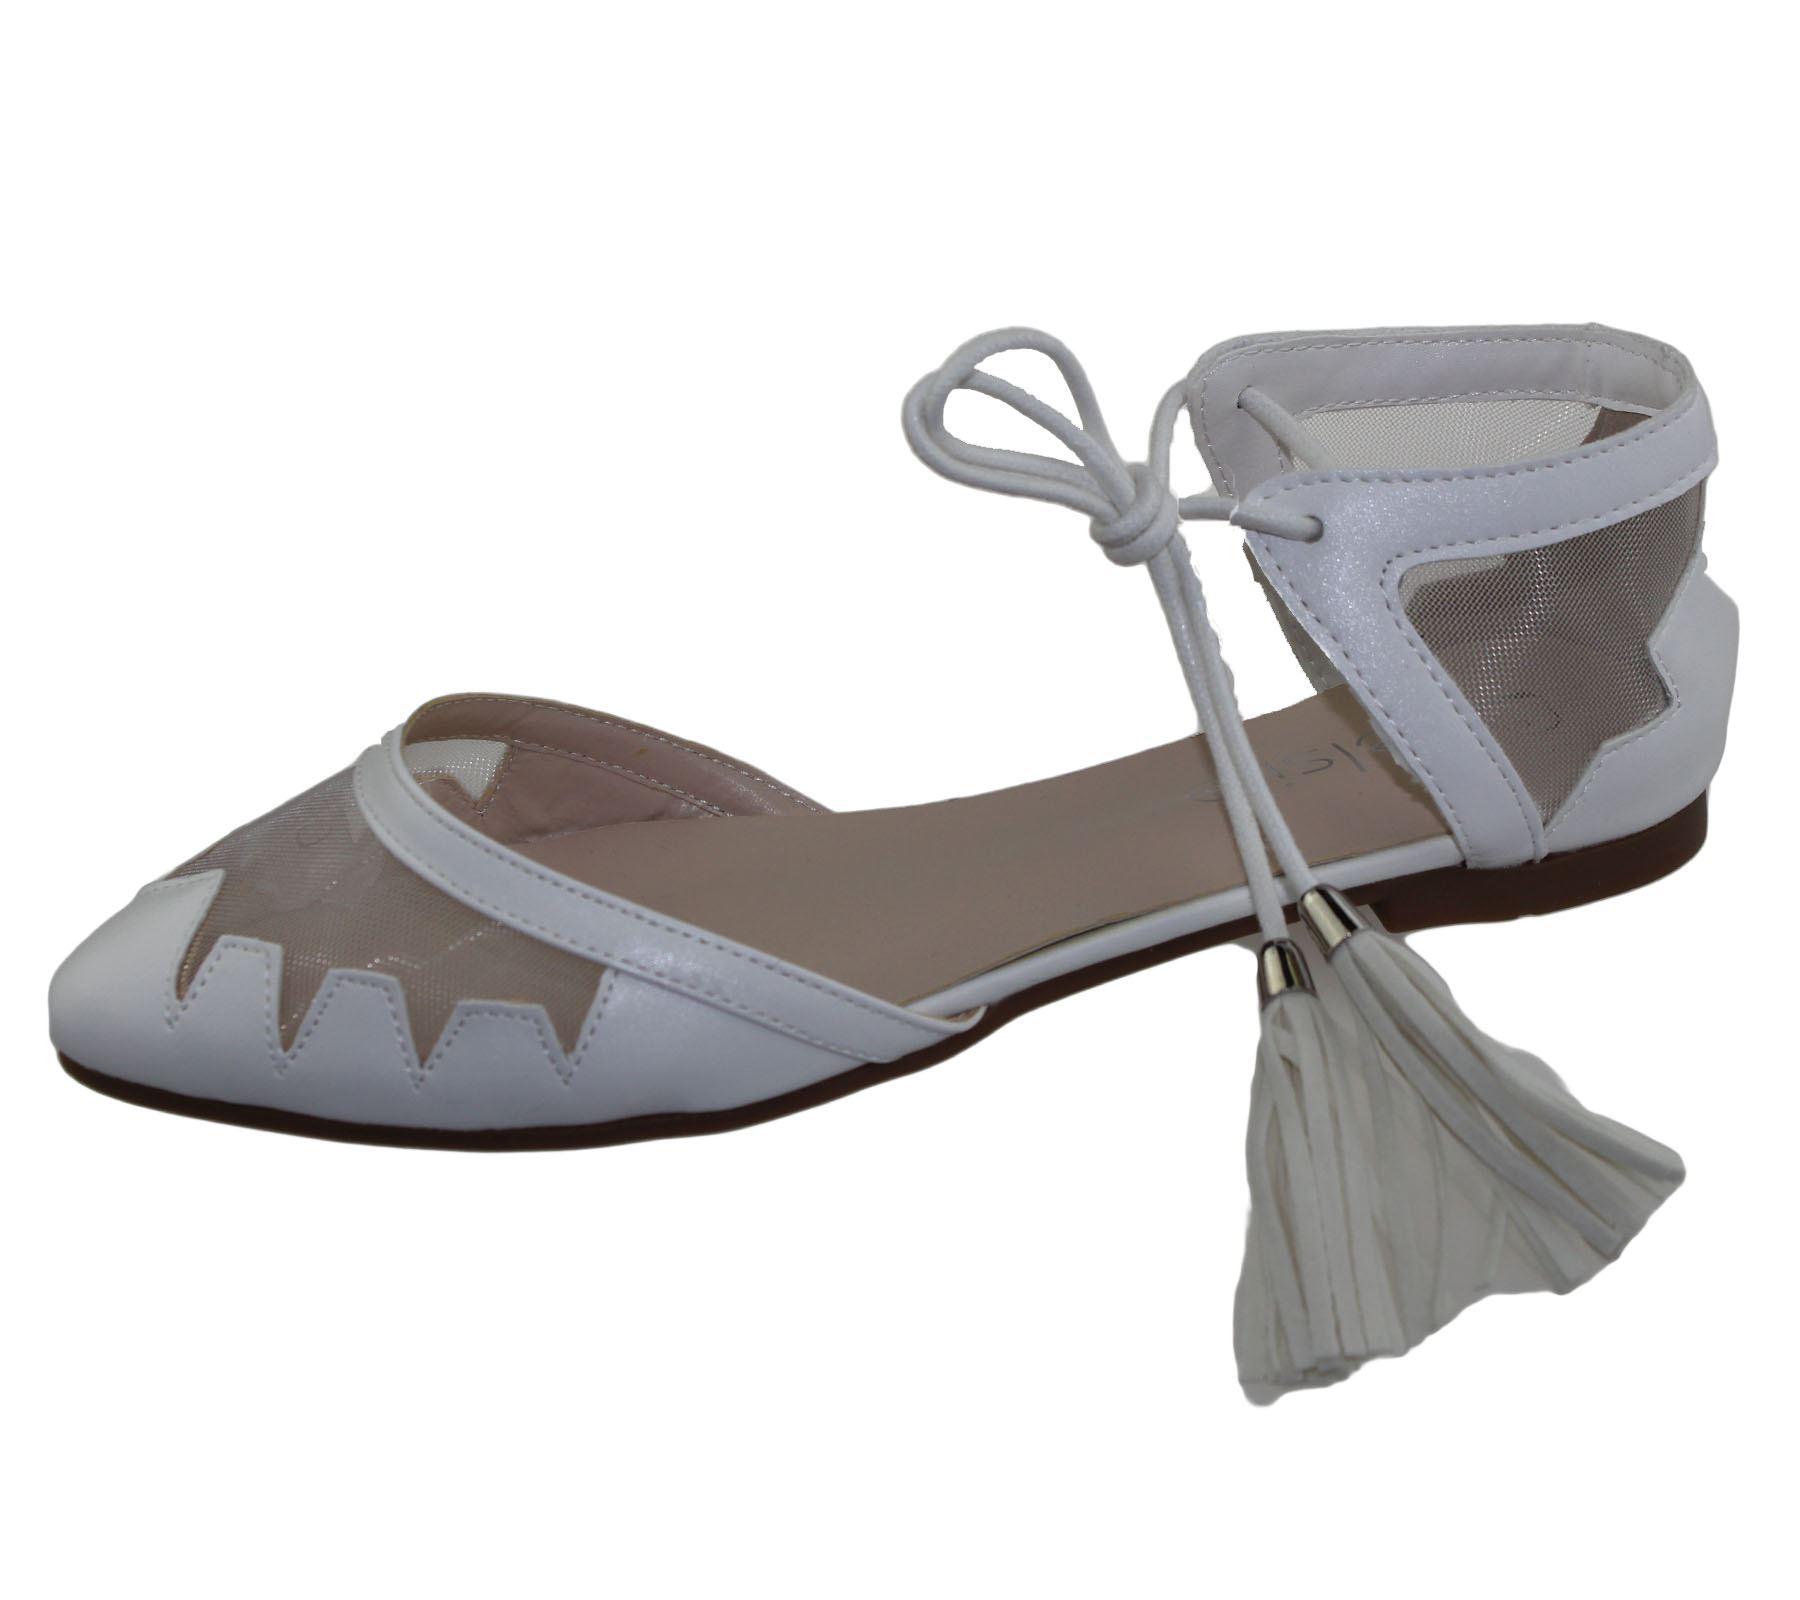 Womens-Flat-Ballerina-Dolly-Pumps-Ballet-Ladies-Summer-Mesh-Tassel-Shoes-Sandals thumbnail 18